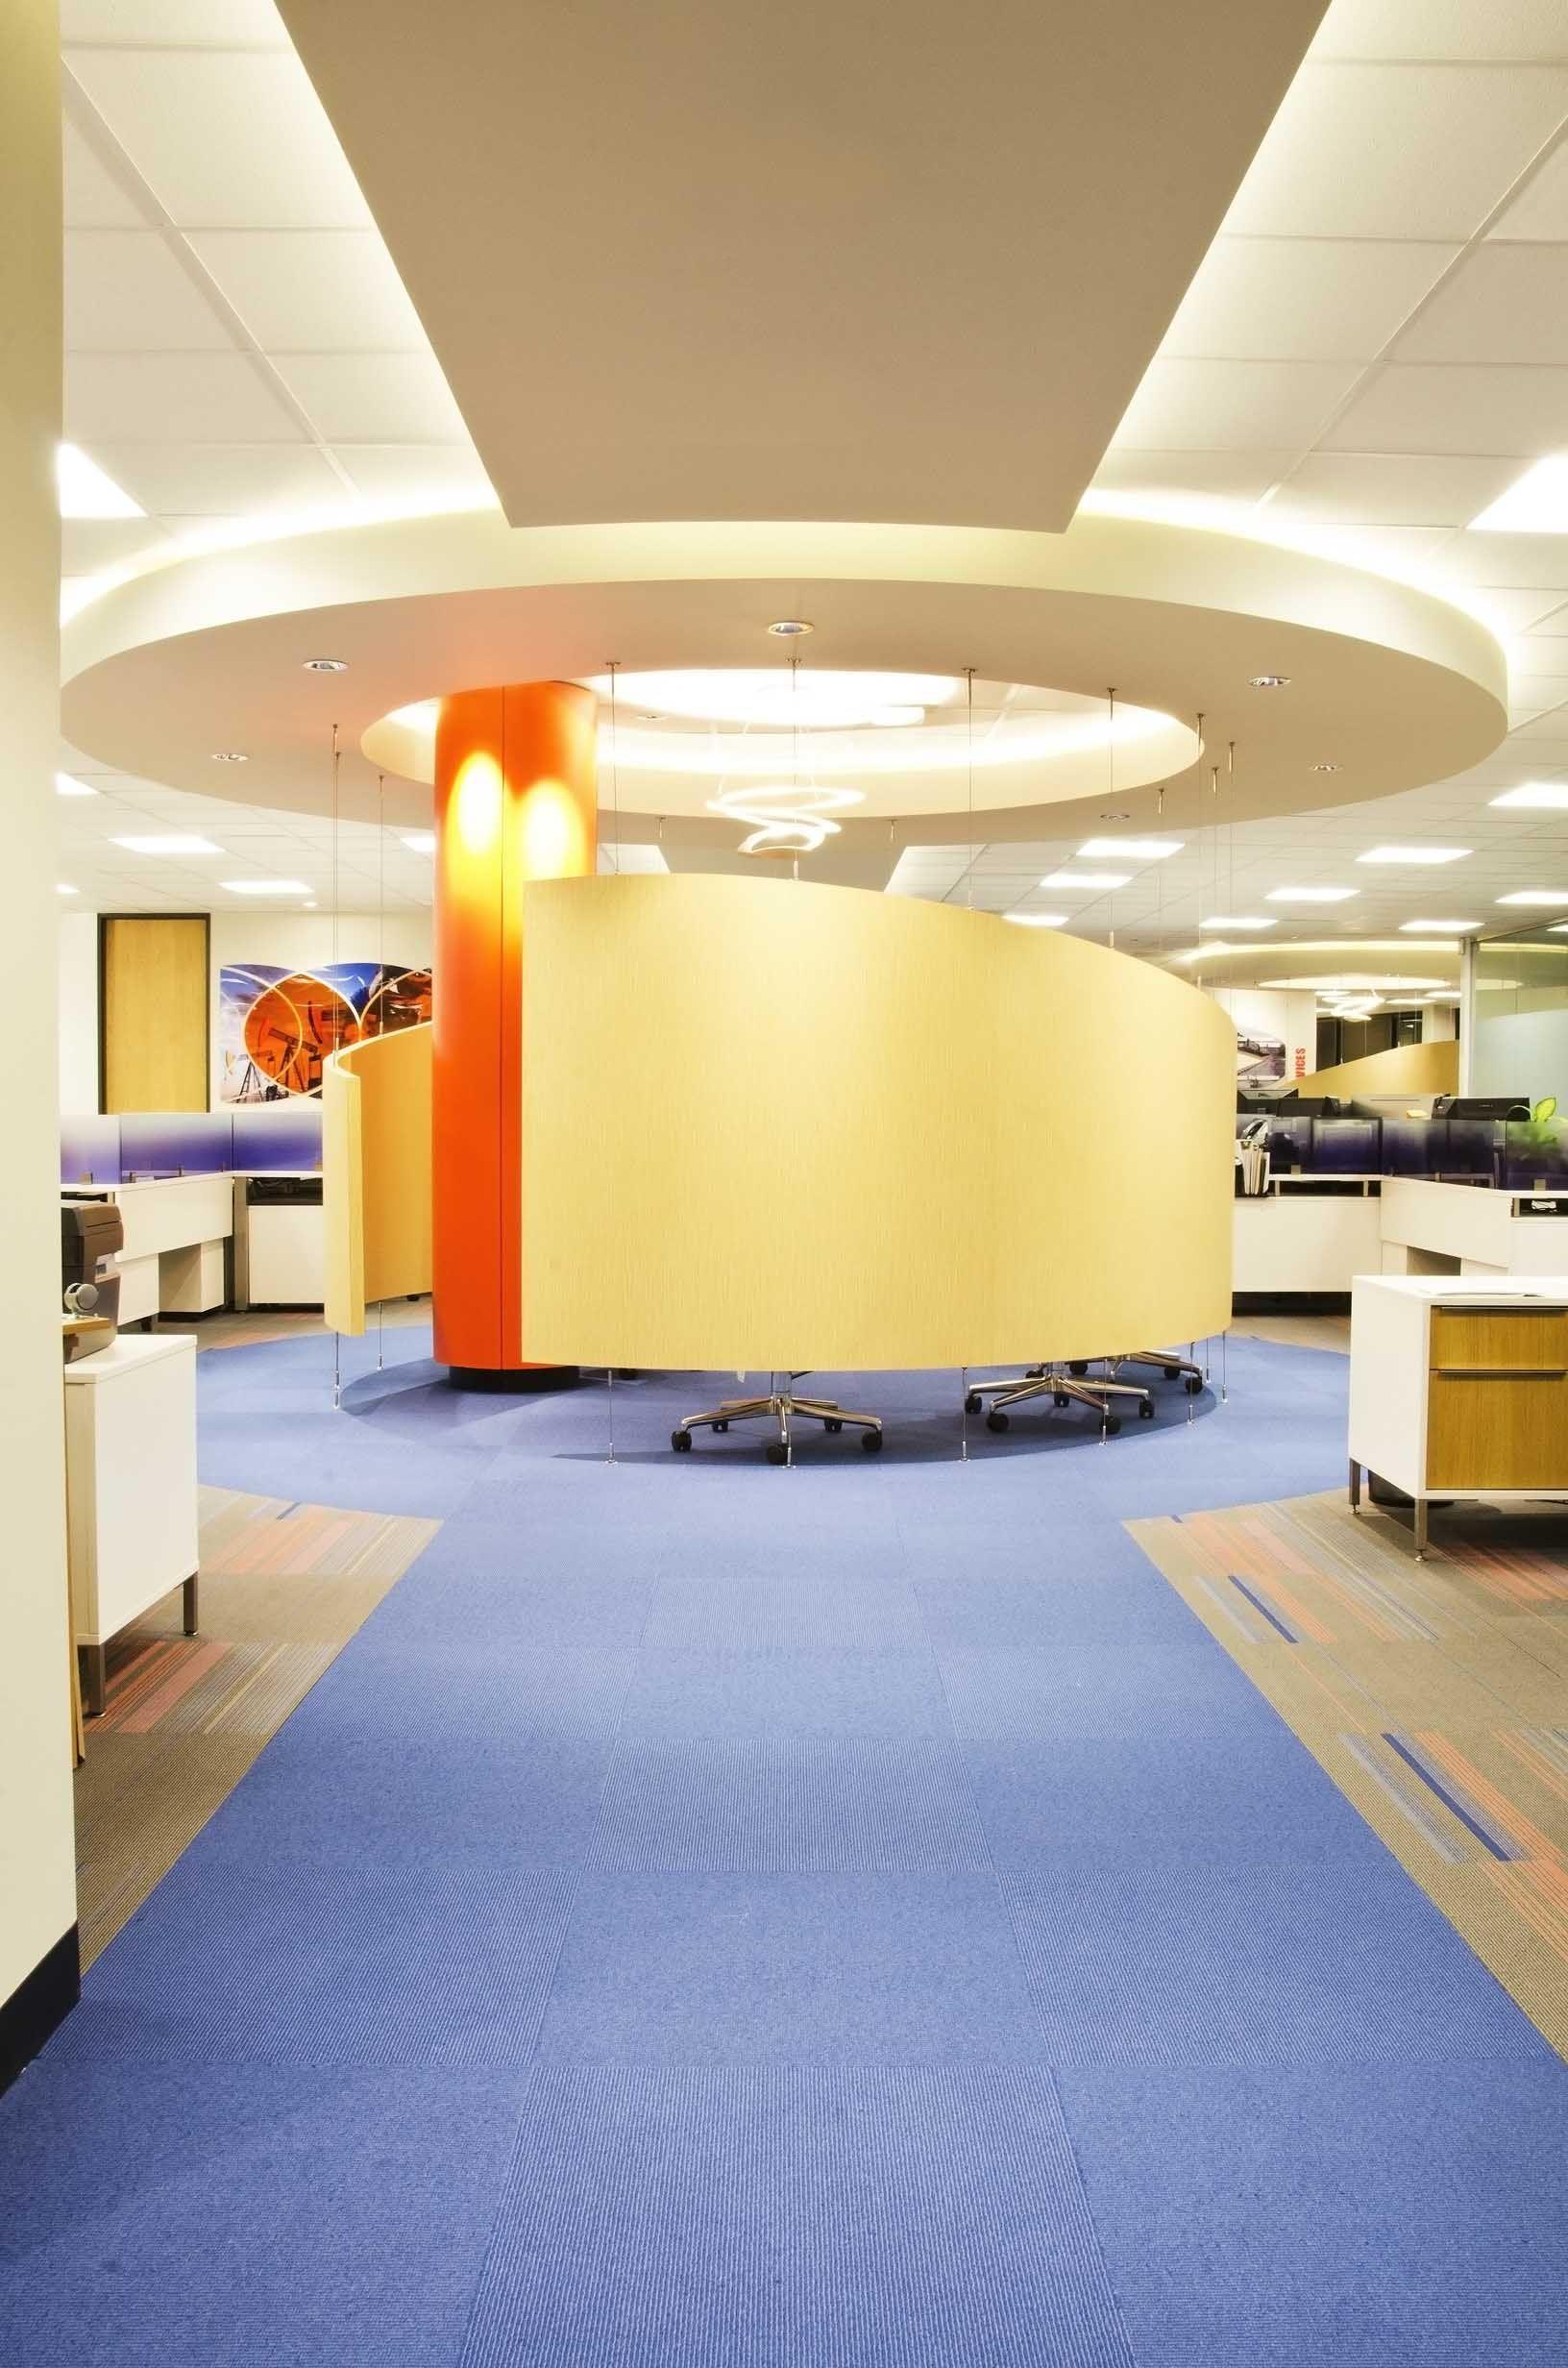 Axiom Visit Www Deskmakers Com Successstories For More Info Benchworx Teamworx Officefurniture Desking Ben Open Floor Plan Eurostyle Office Environment